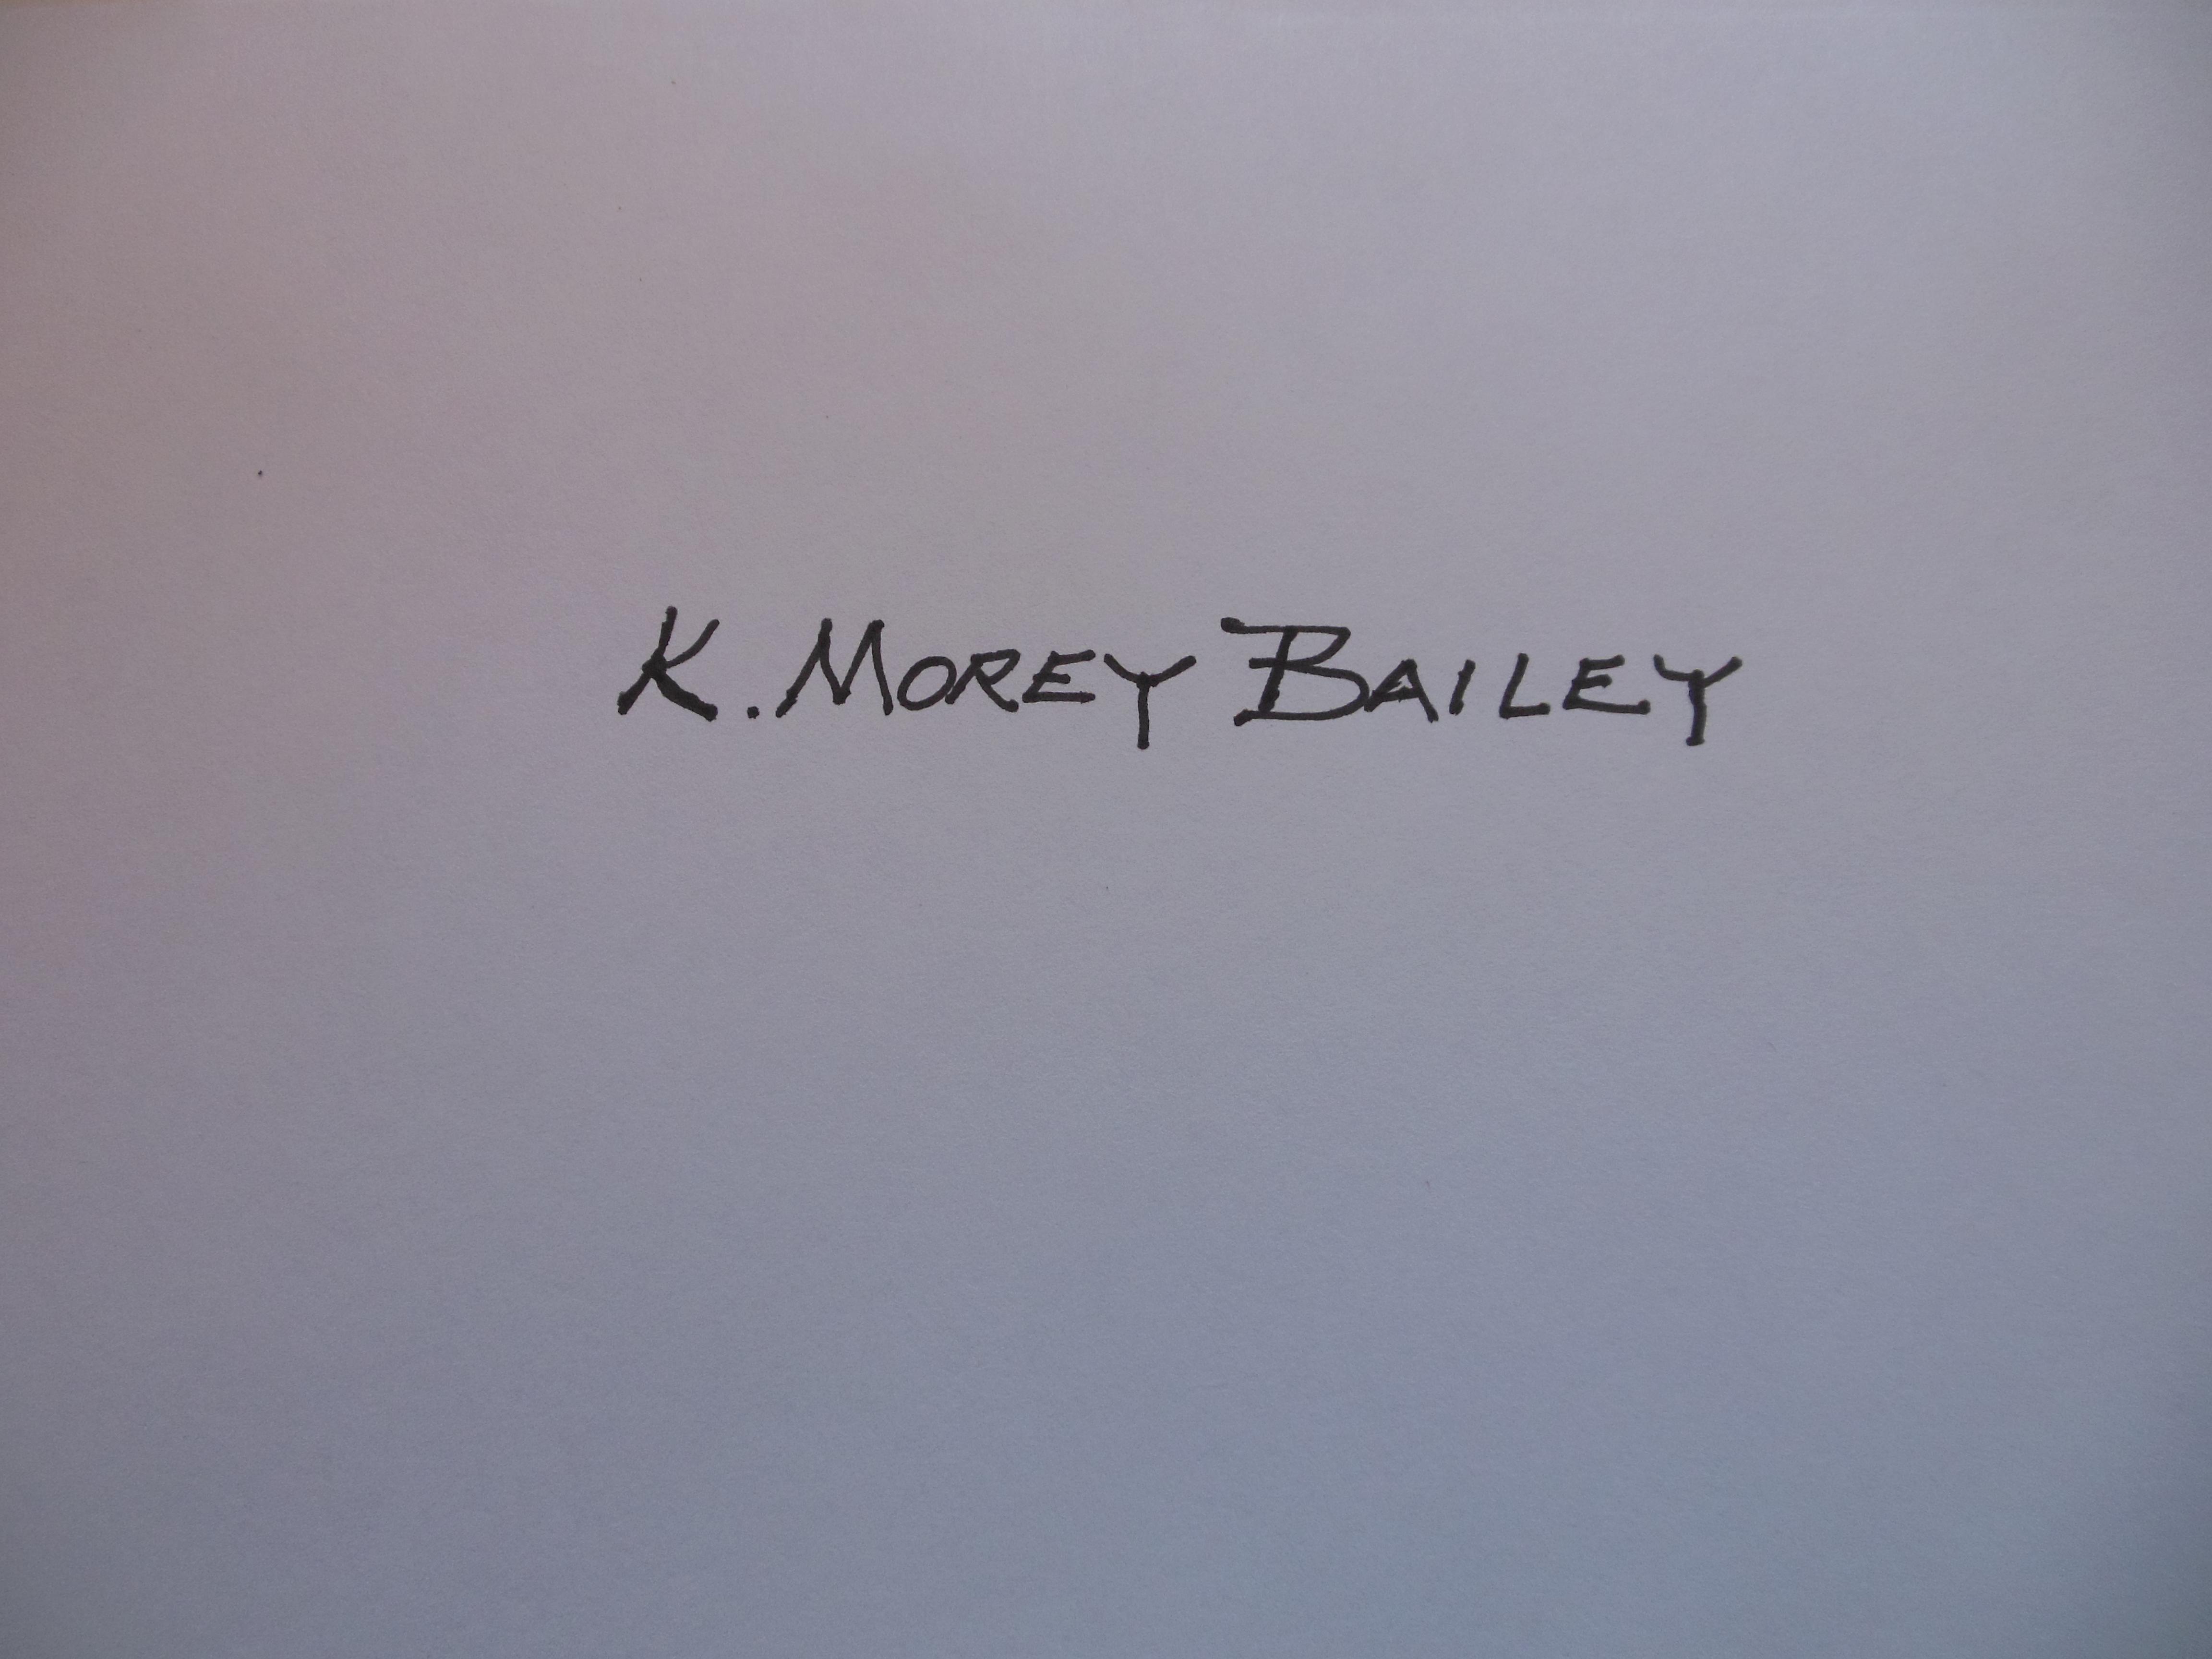 Kathleen M. Bailey Signature